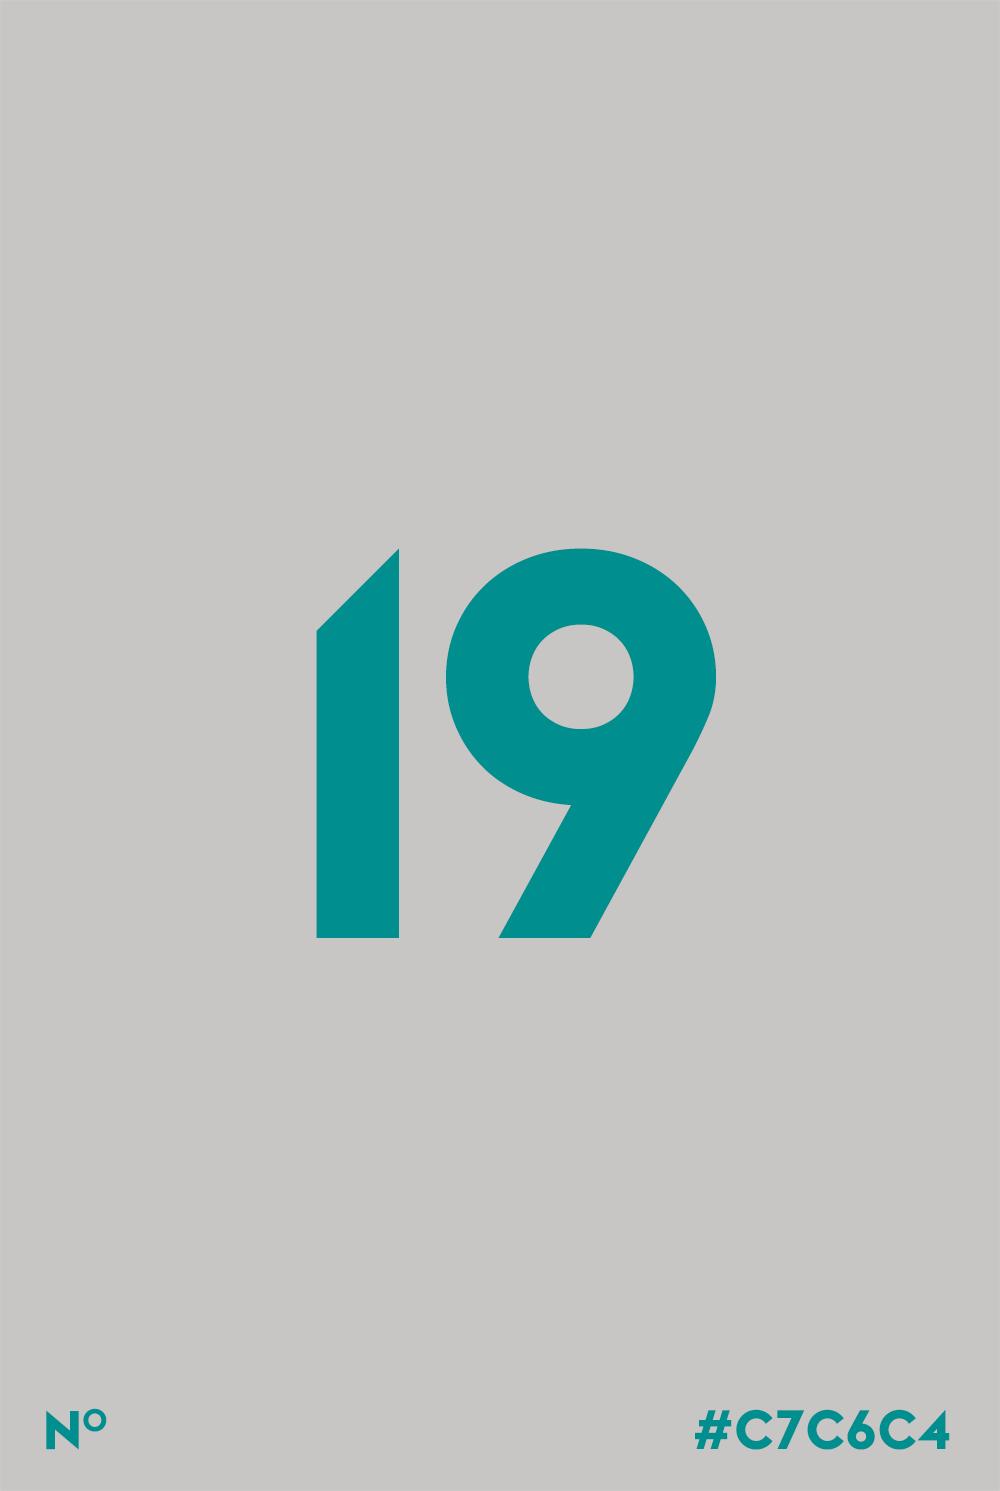 cc_0018_19